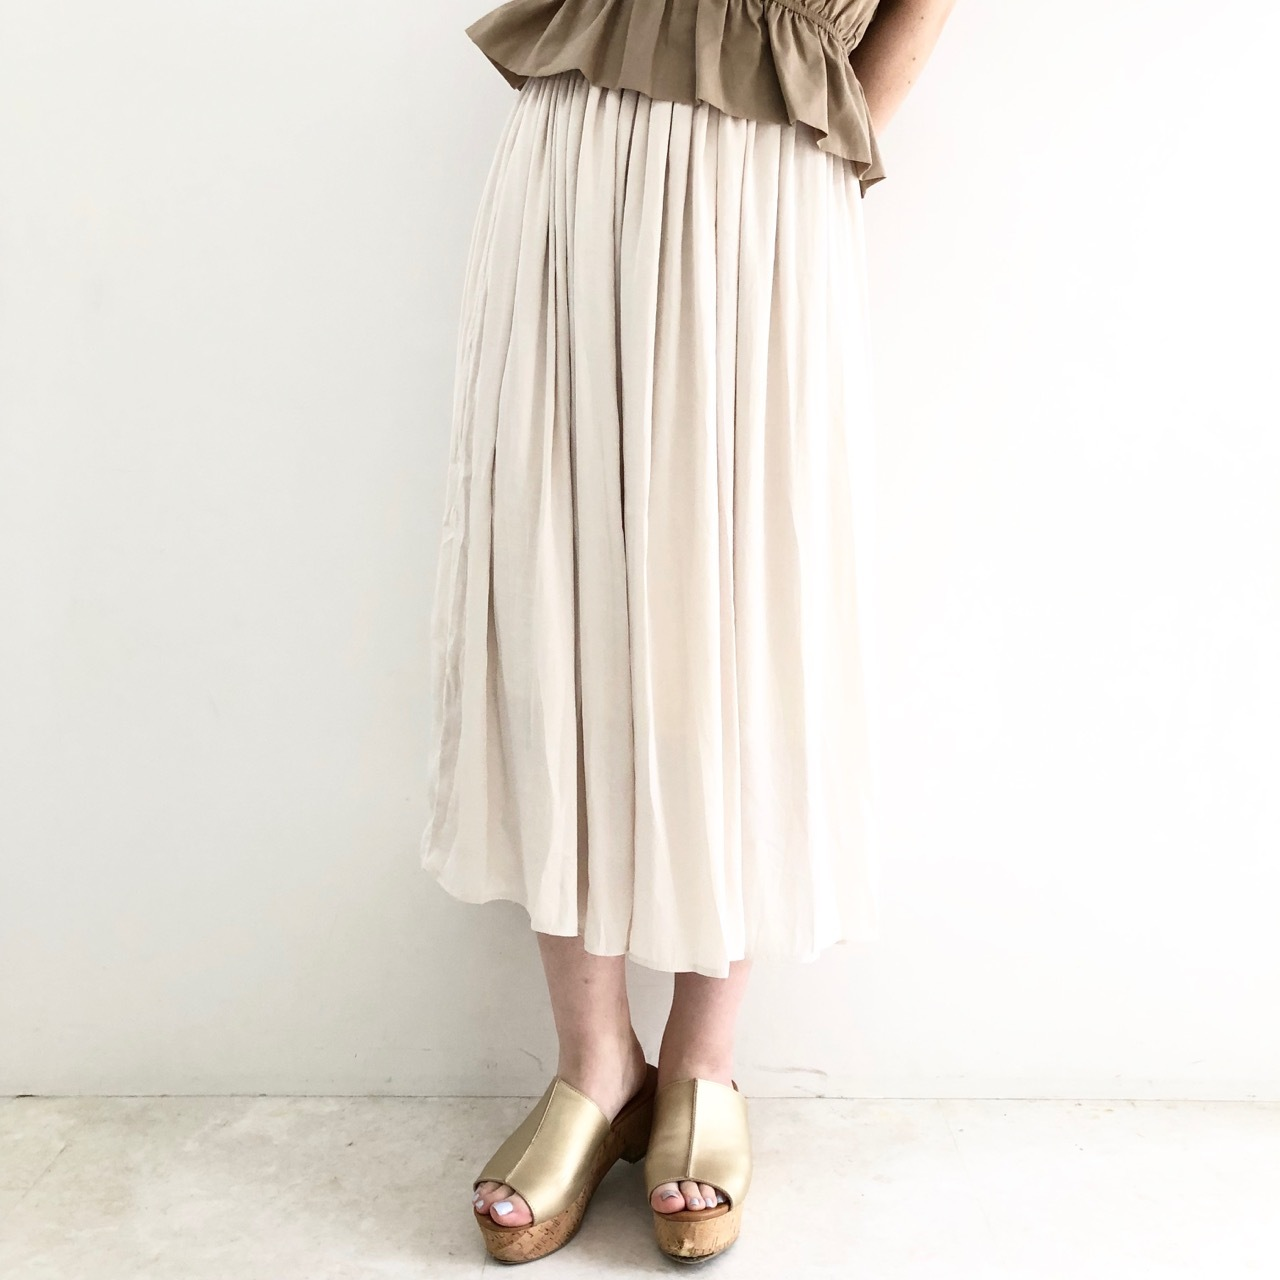 【 Valance Select 】ヴィンテージサテンスカート